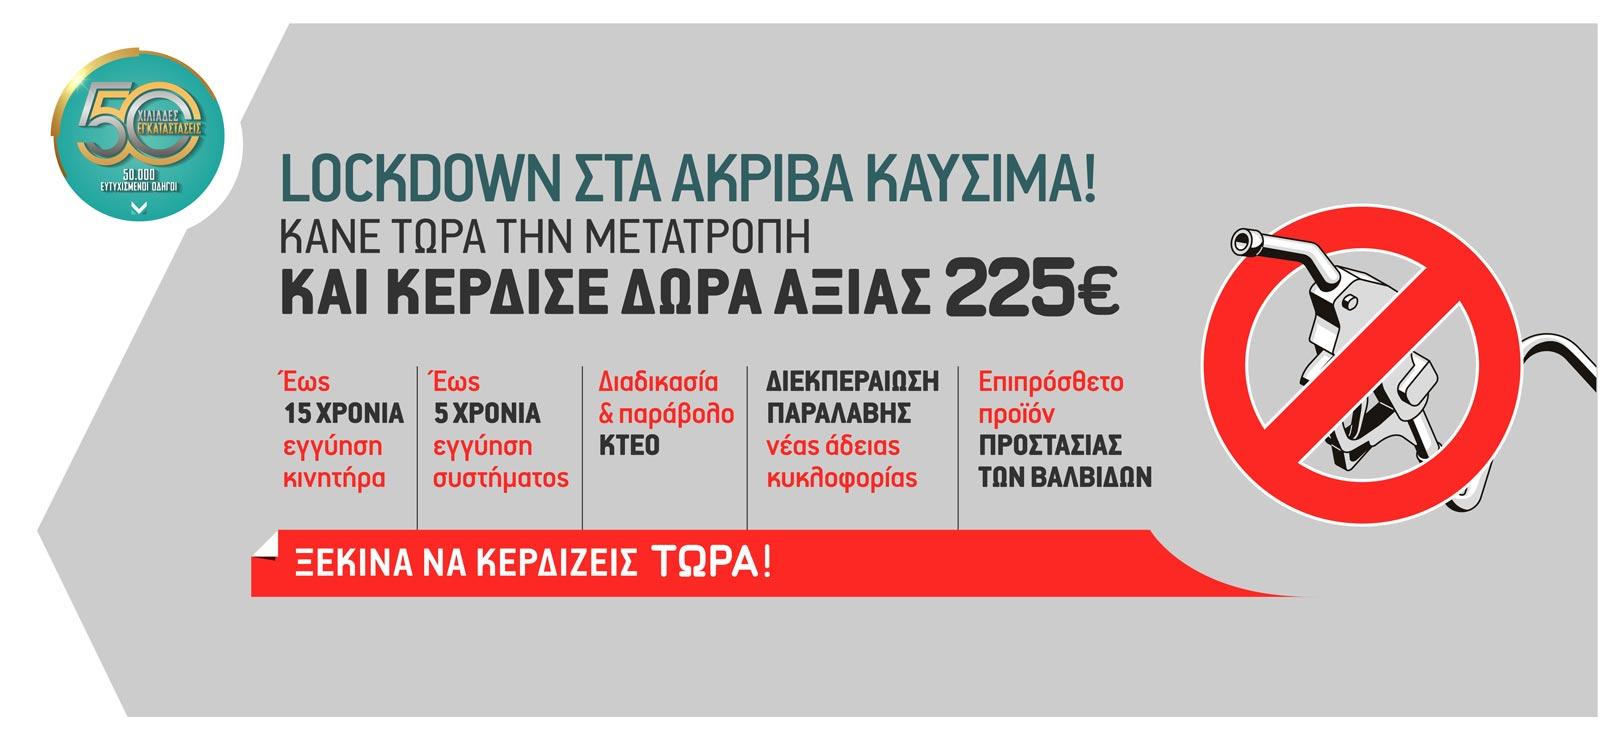 Autumn-2-2020-Banner-Slideshow-1620x740-02